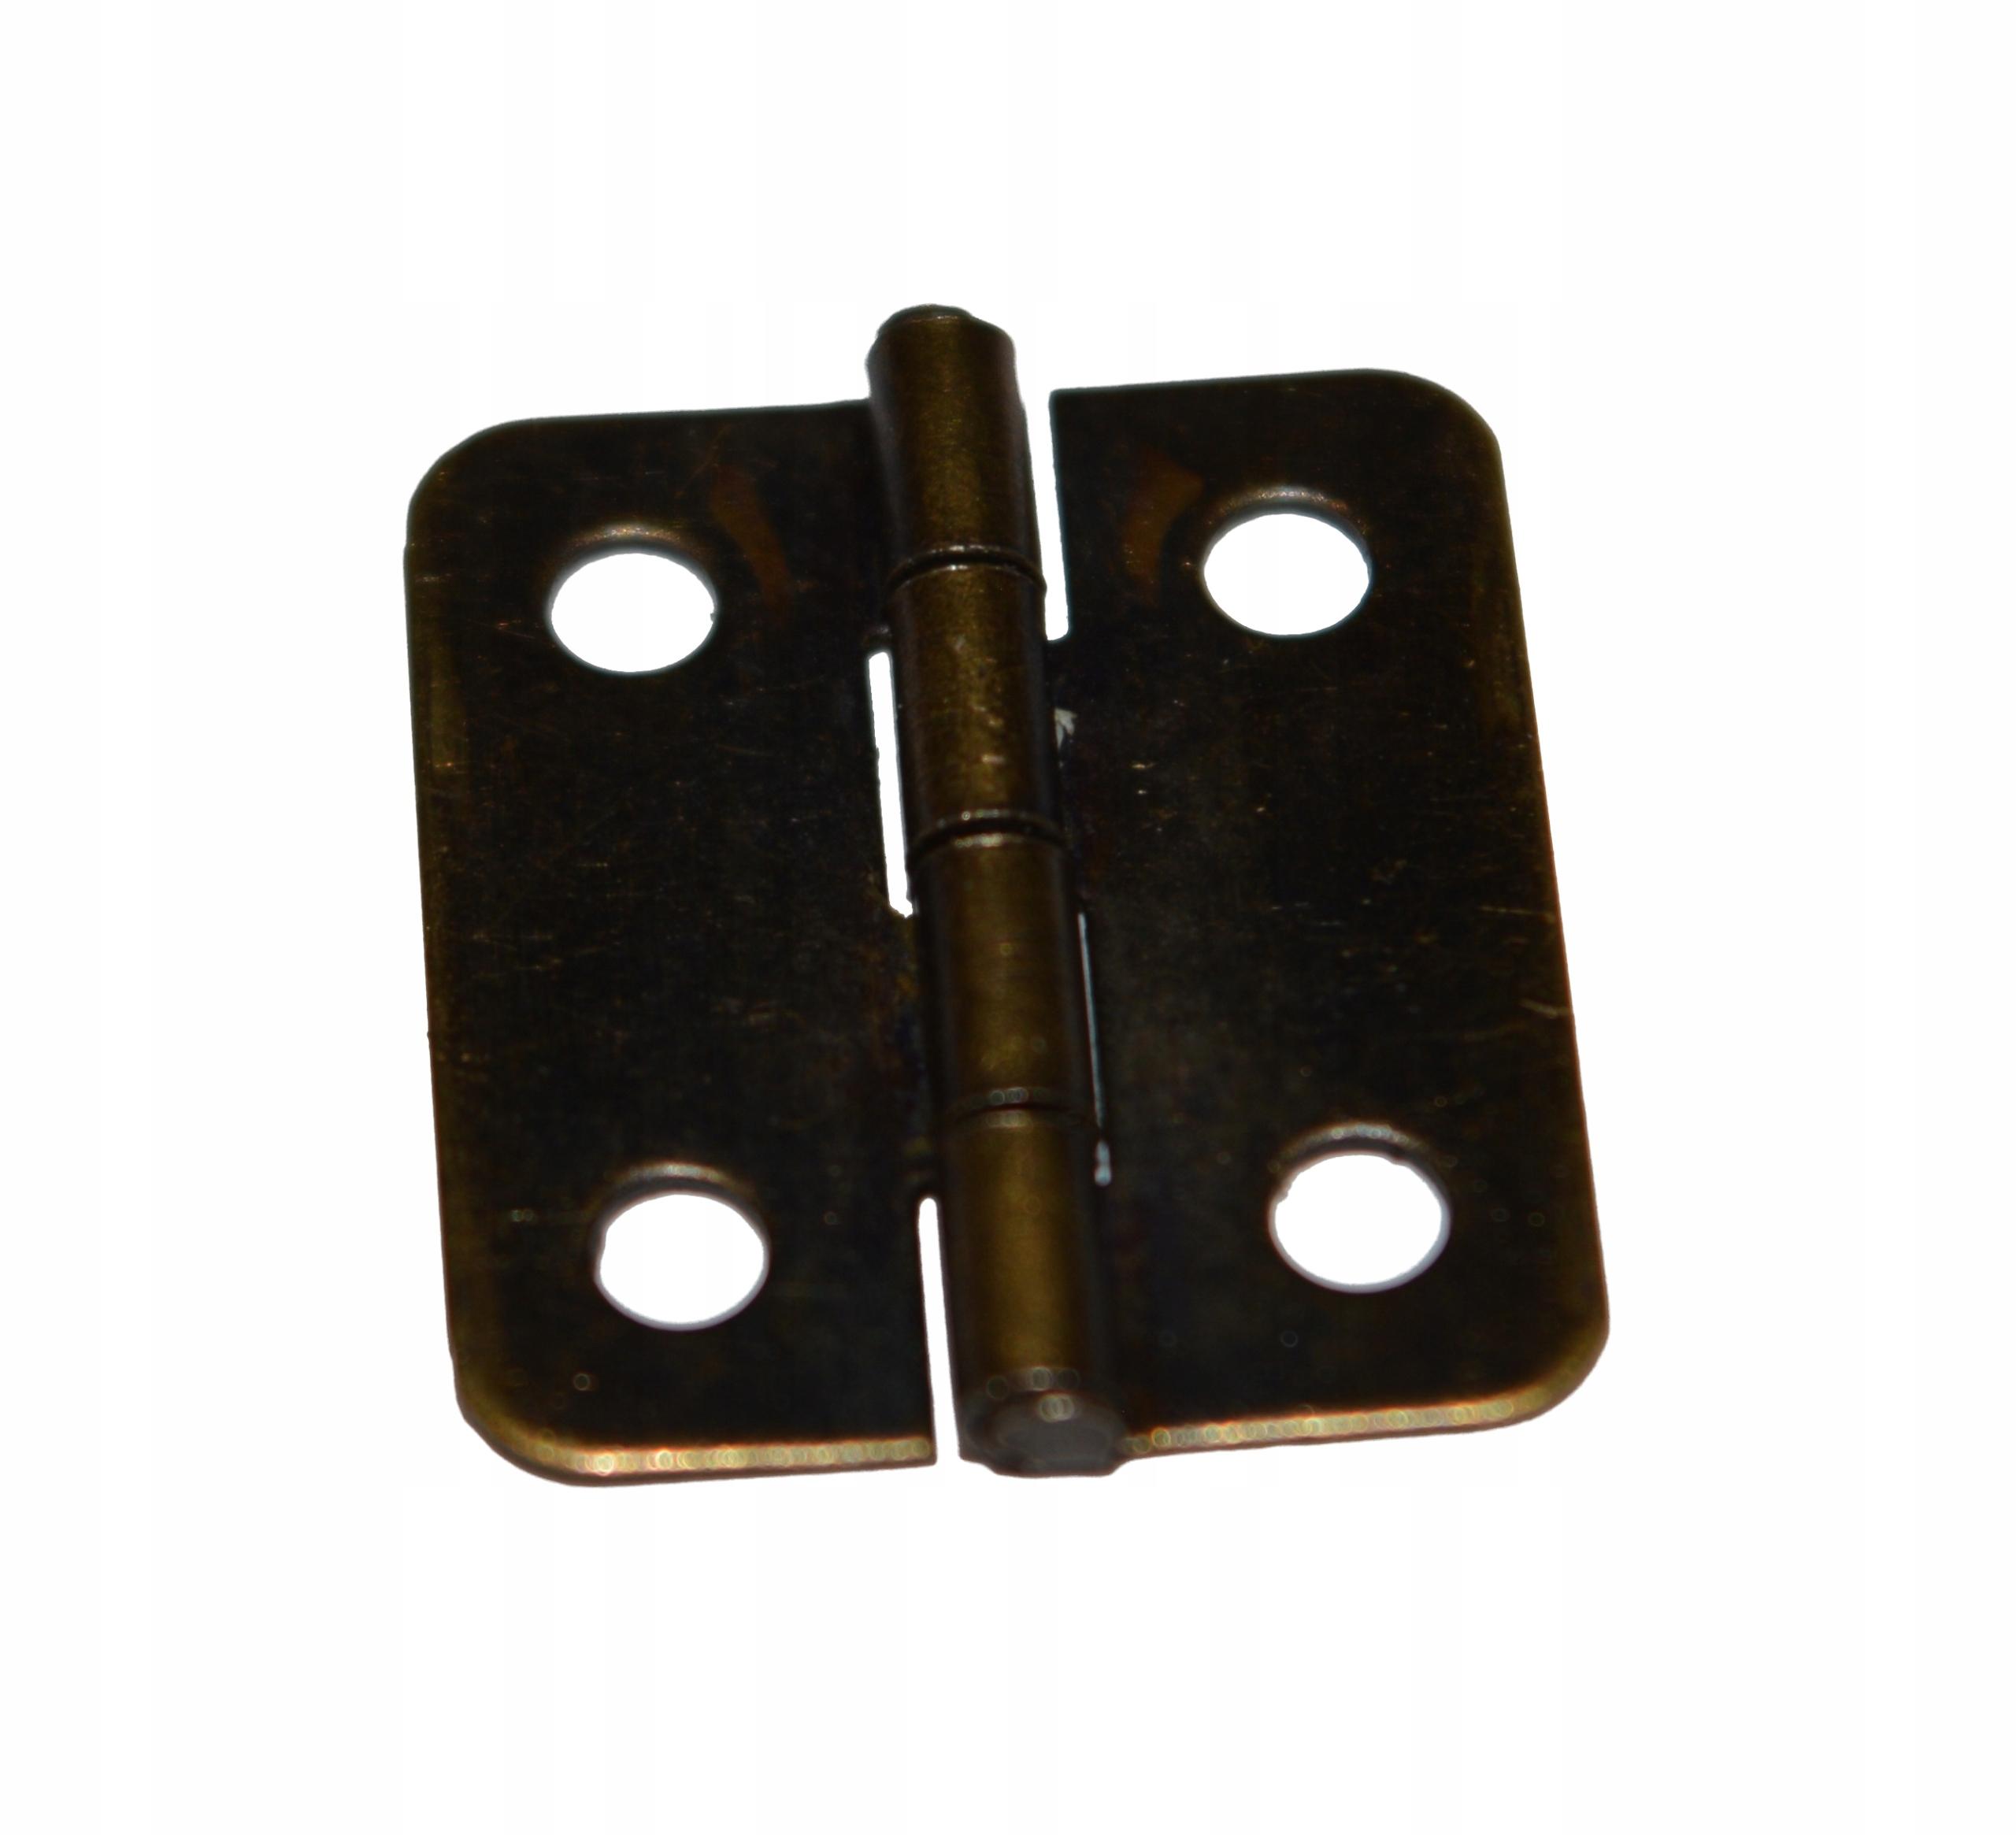 Петля металлический декоративный для шкатулки коробки